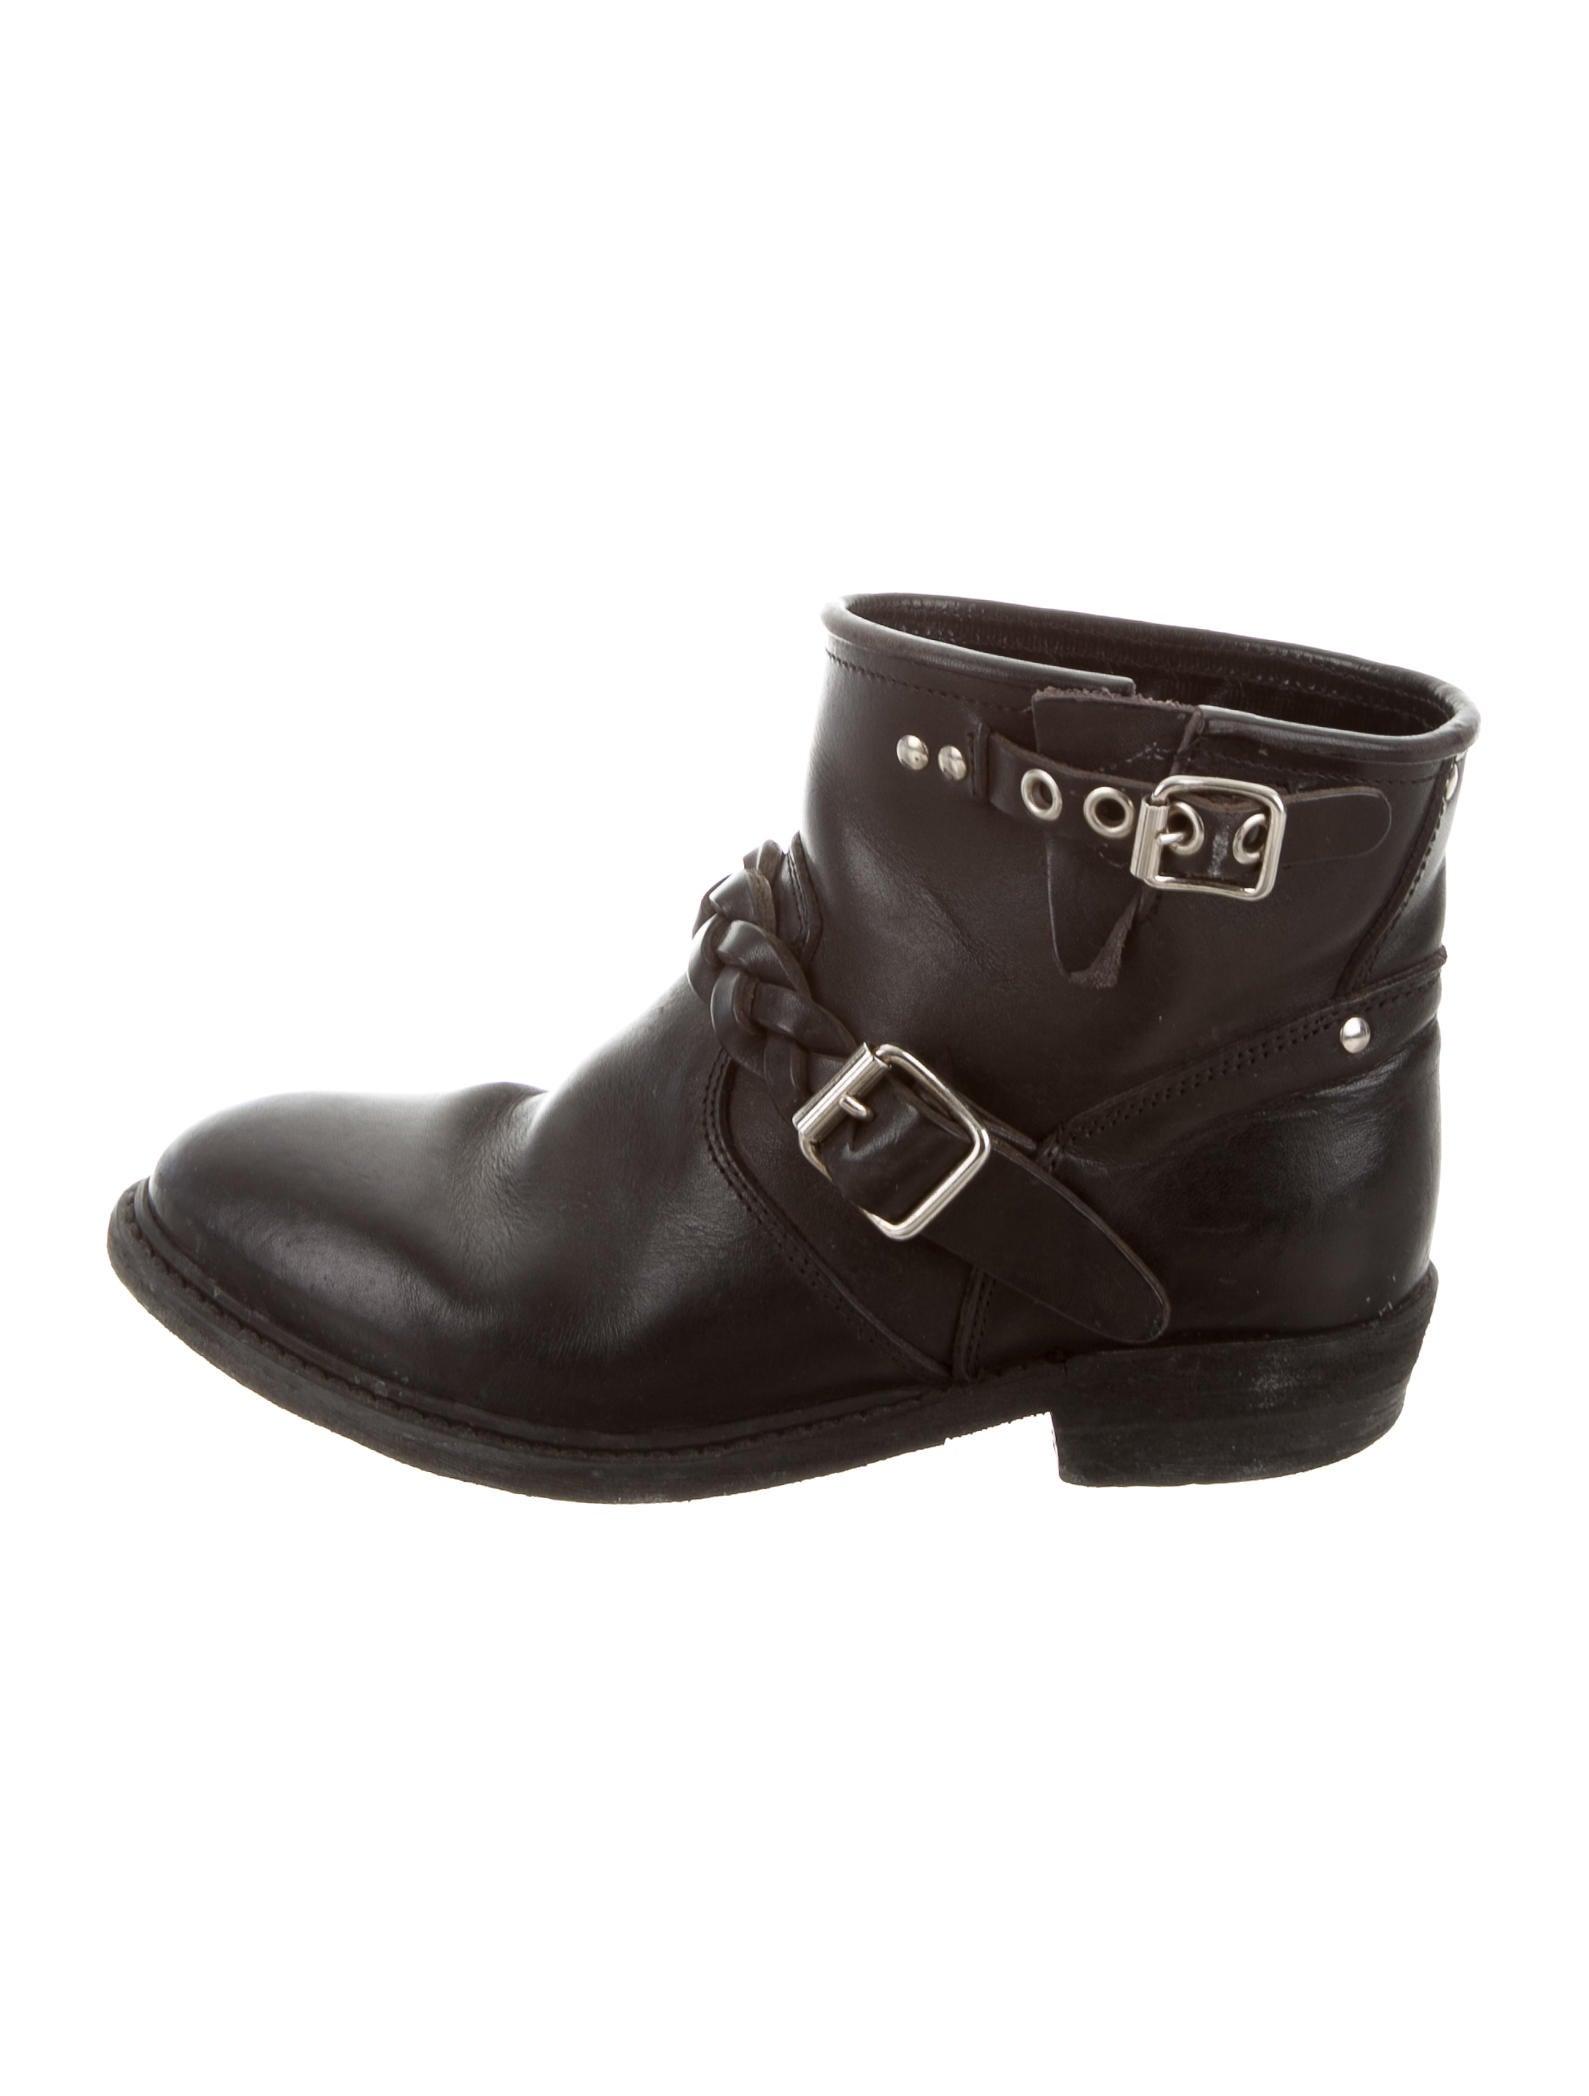 golden goose distressed biker ankle boots shoes wg525335 the realreal. Black Bedroom Furniture Sets. Home Design Ideas